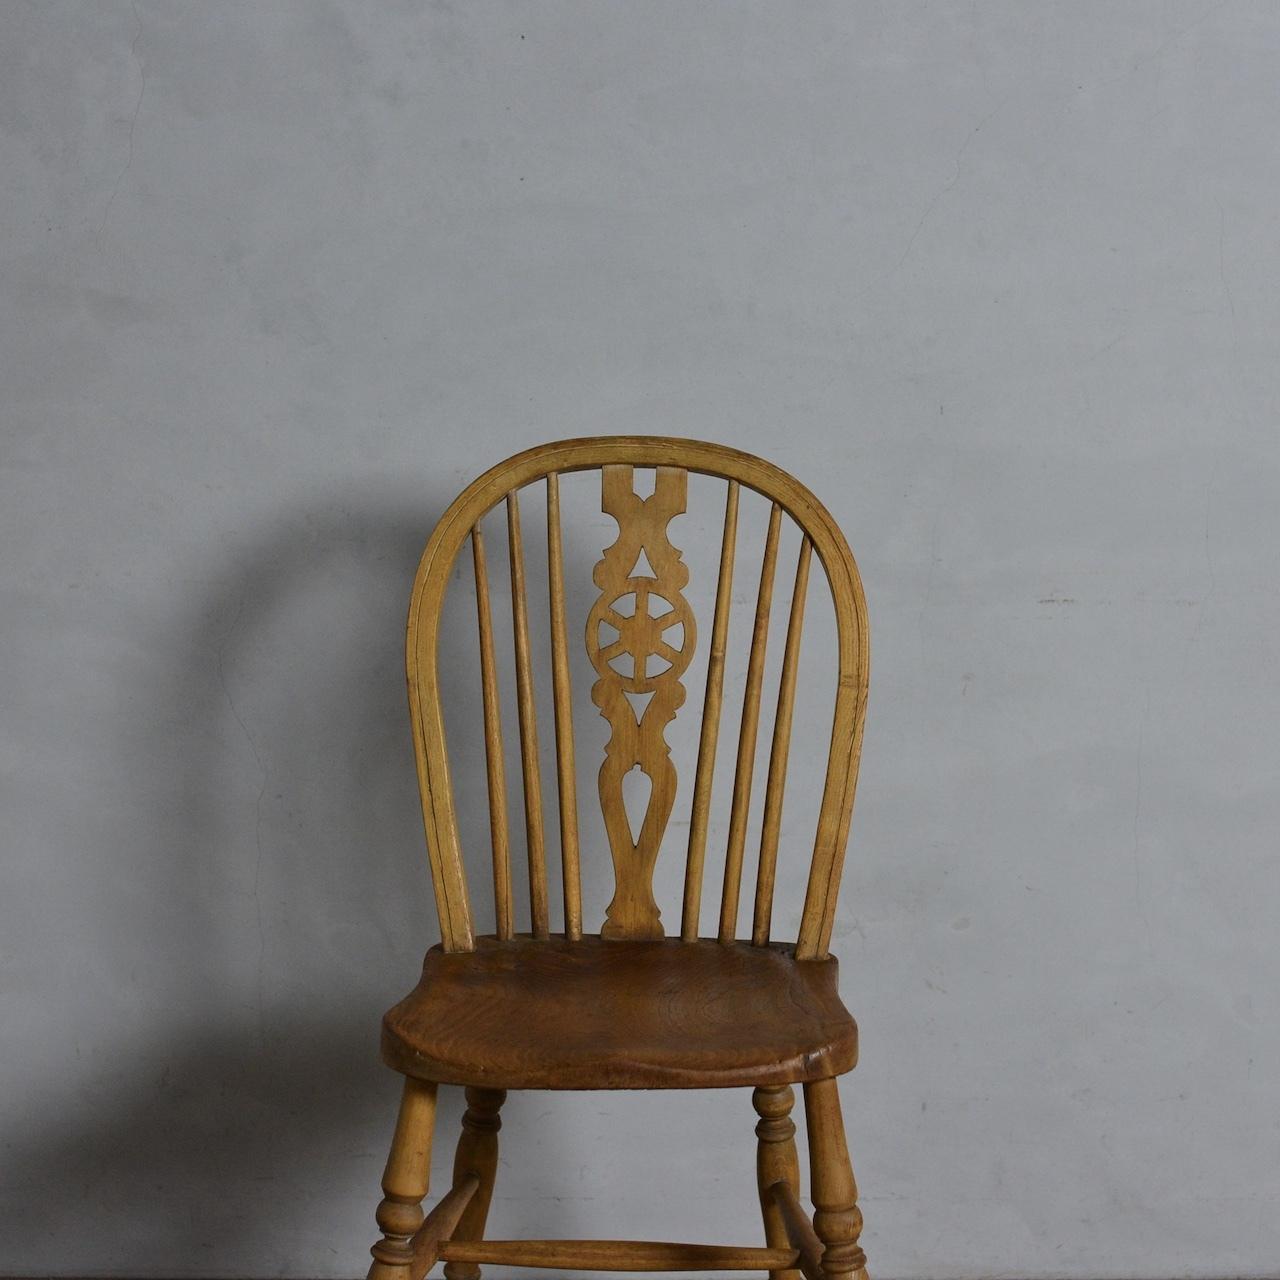 Wheelback Chair / ホイールバック チェア 【A】〈ダイニングチェア・ウィンザーチェア・椅子〉112086